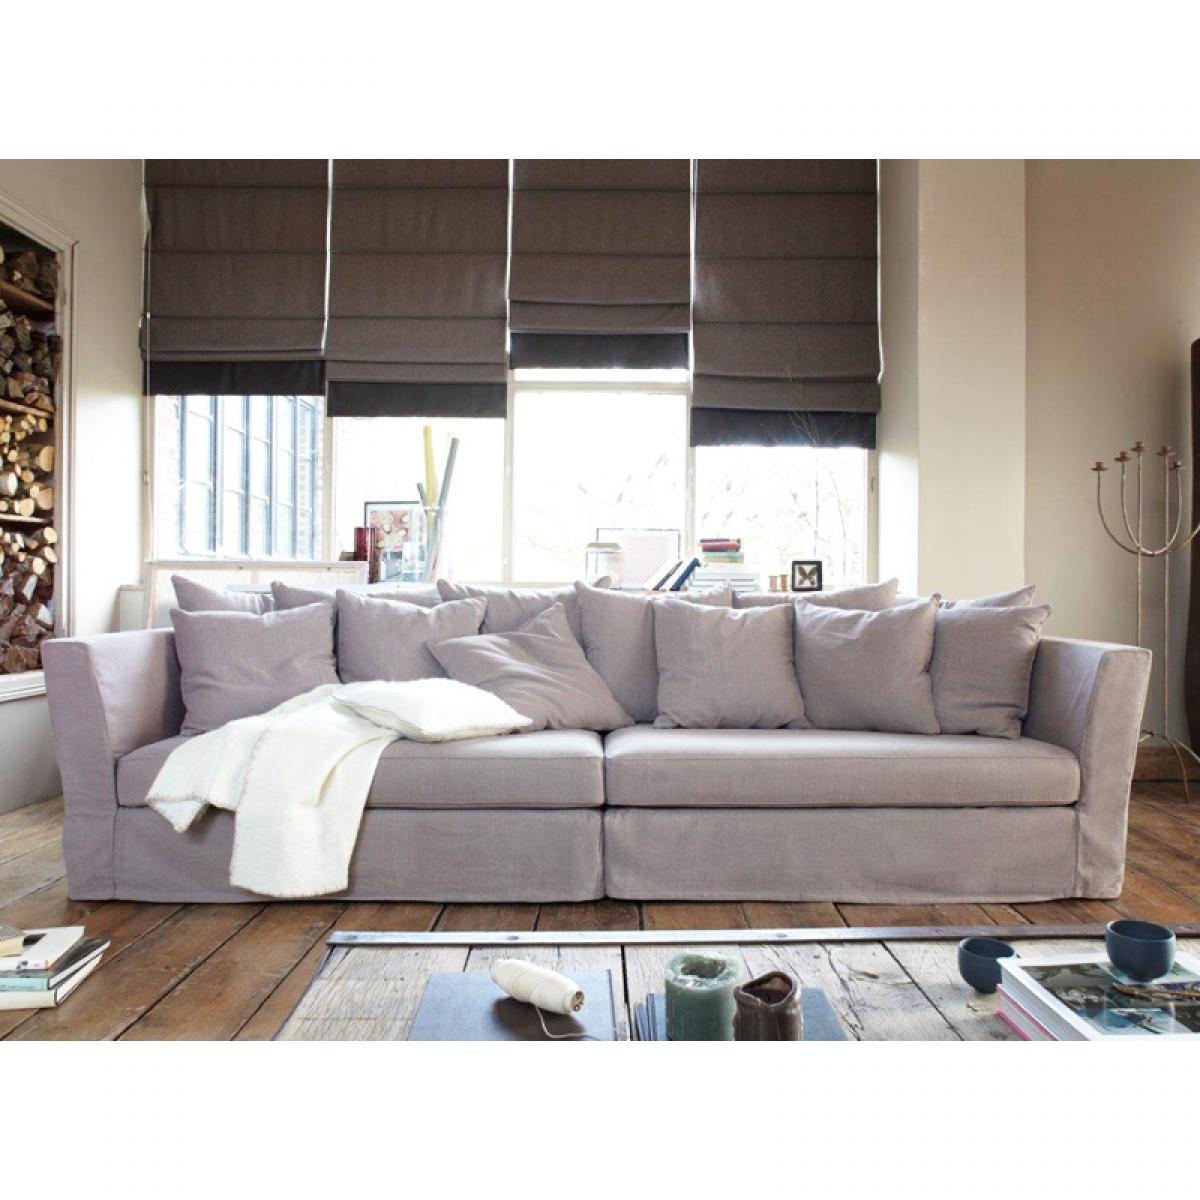 photos canap home spirit avis. Black Bedroom Furniture Sets. Home Design Ideas